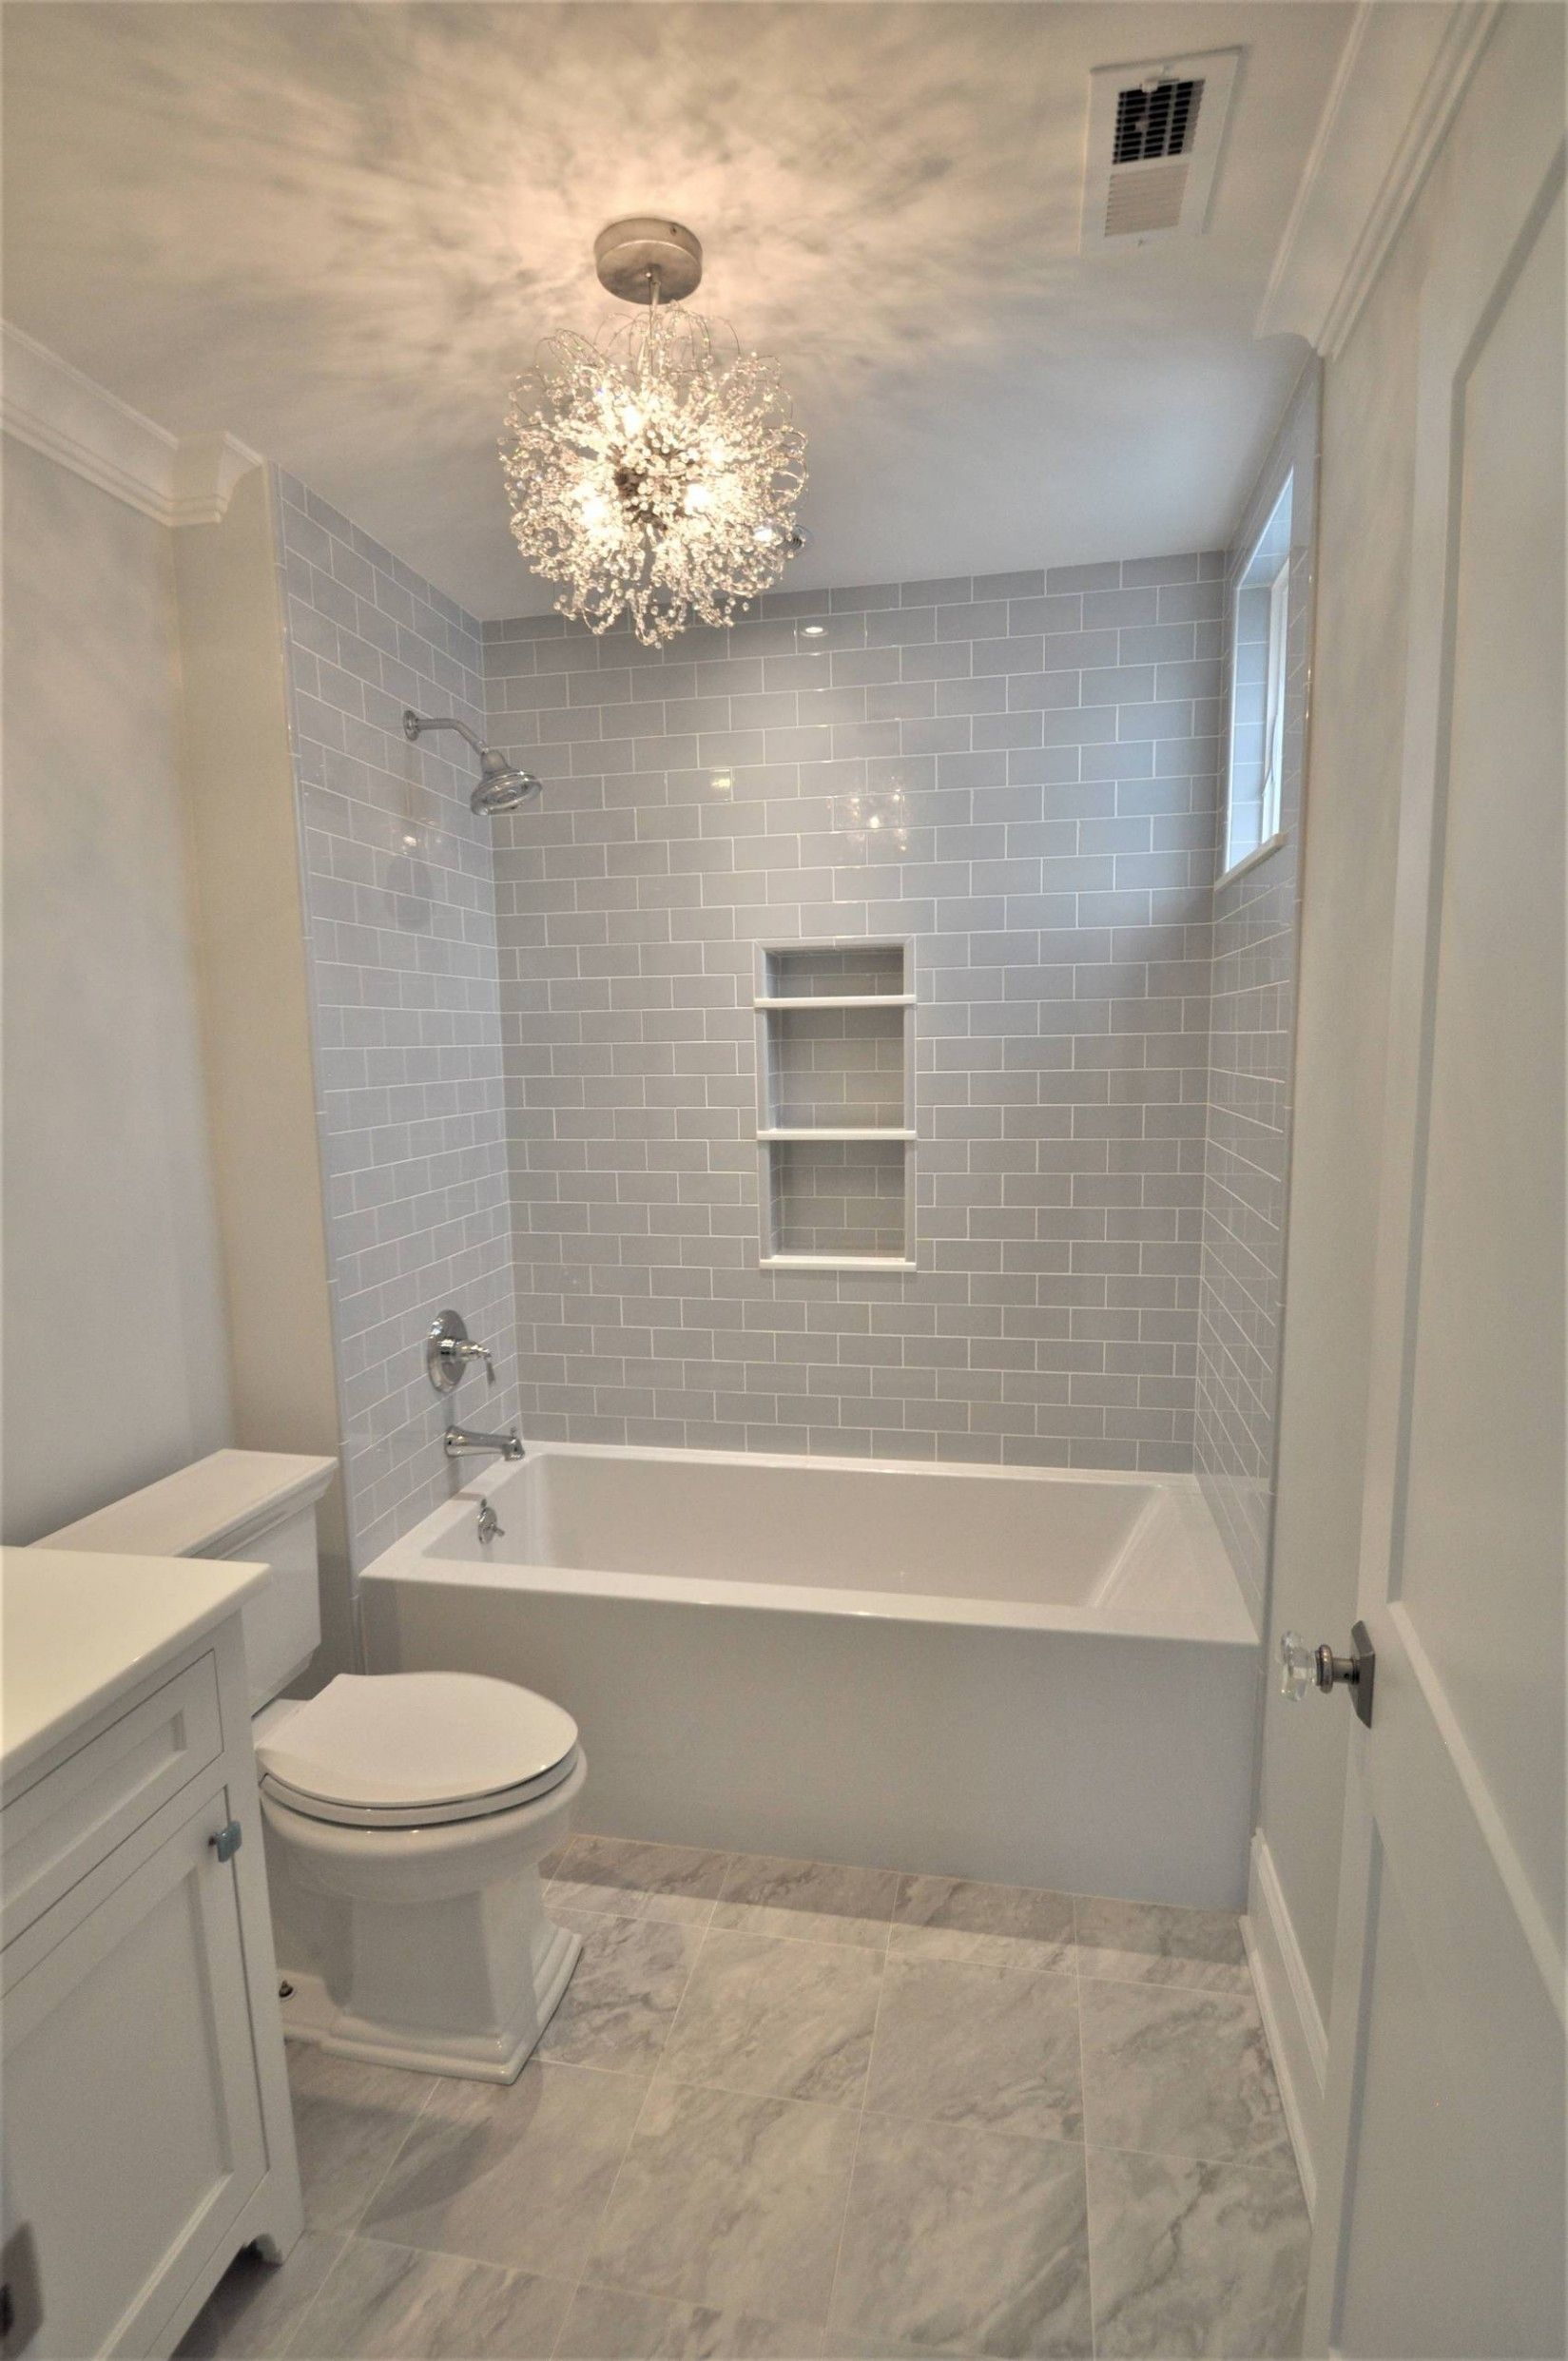 Show Me Small Bathroom in 2020 | Bathroom design small ...